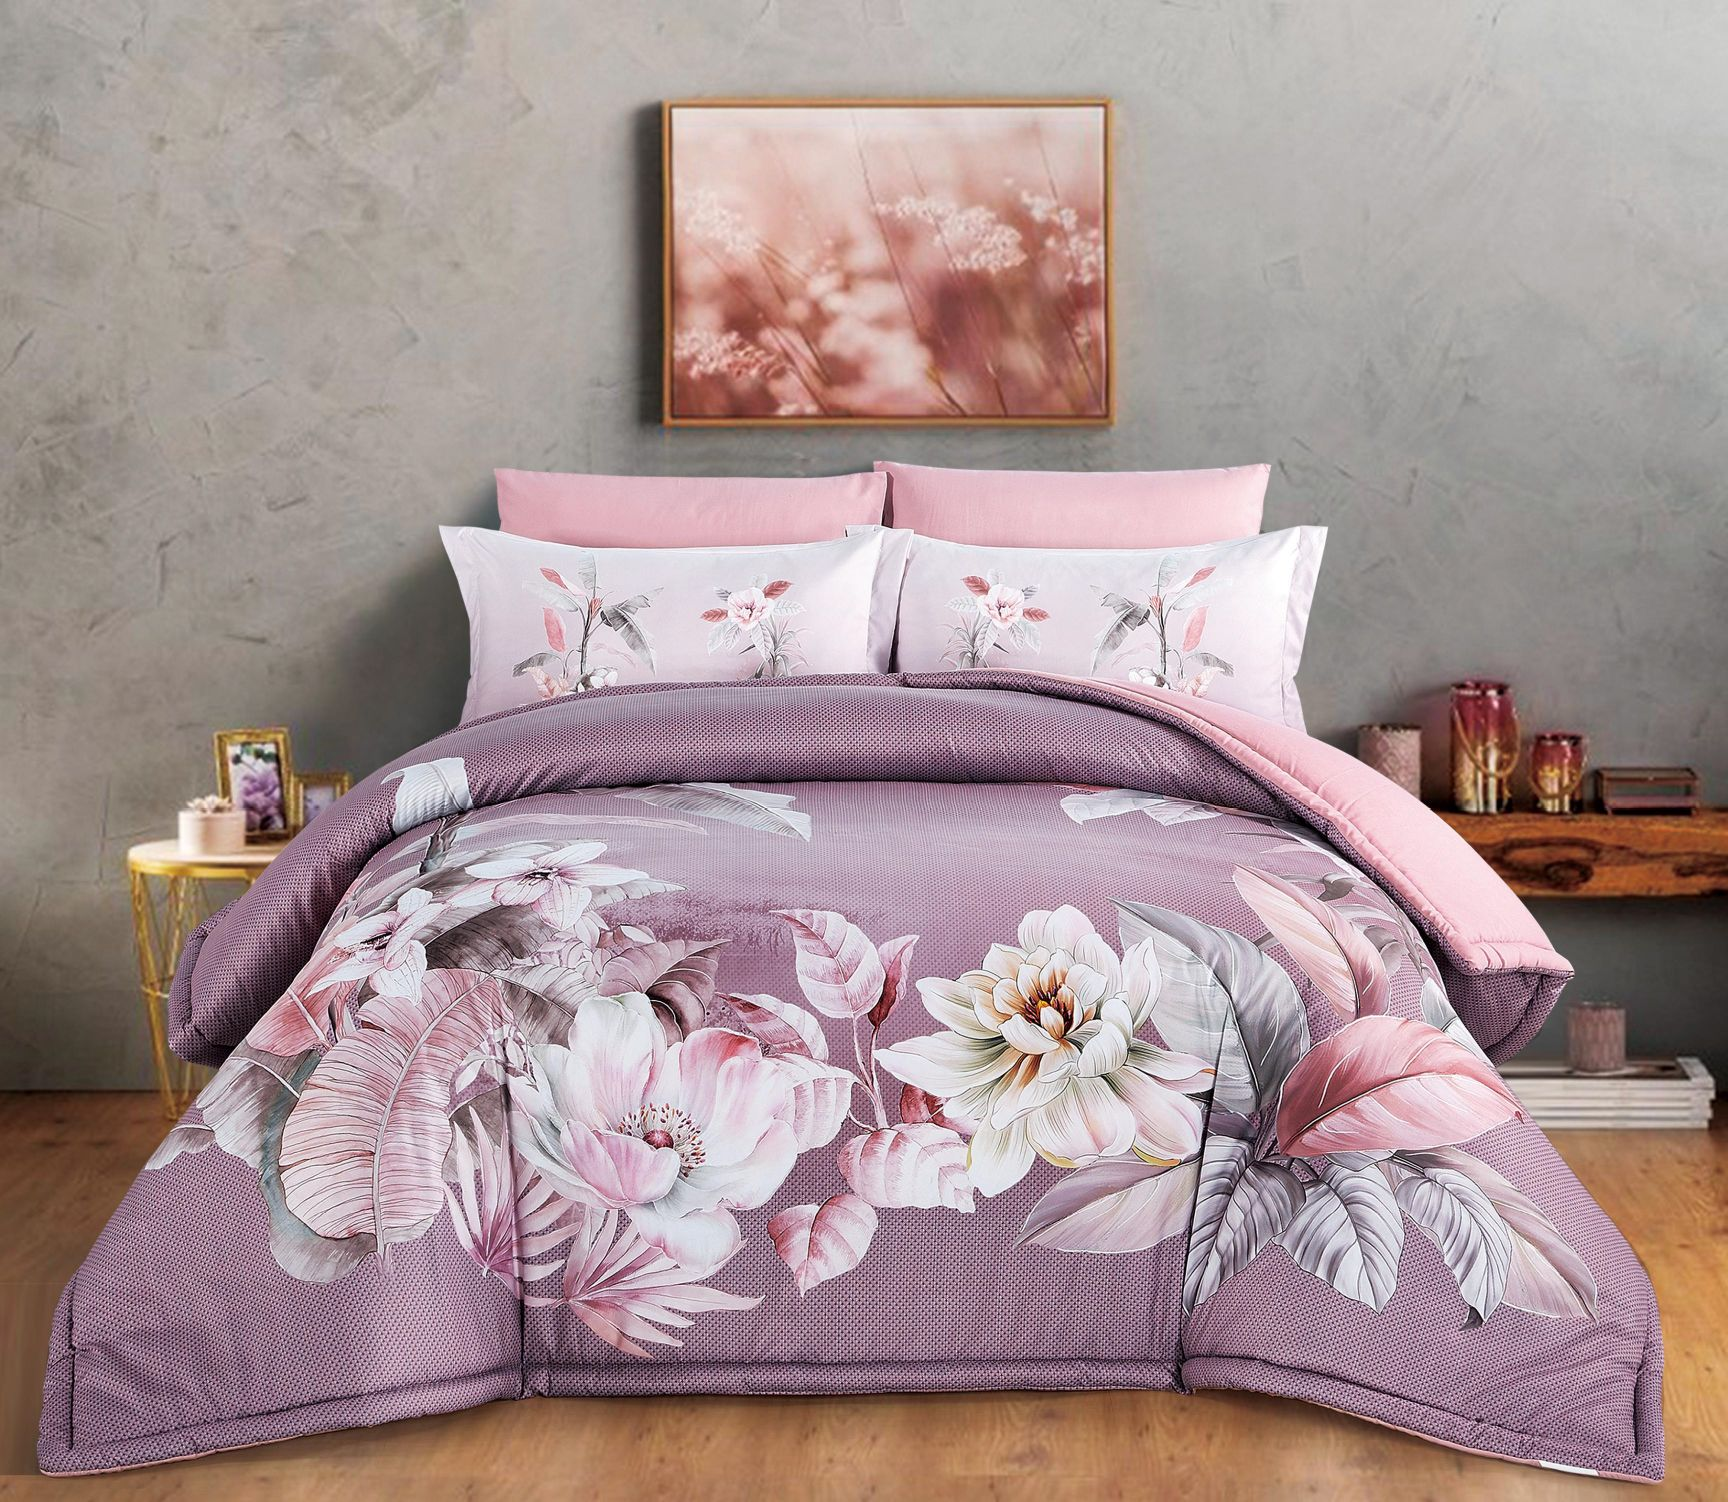 طقم لحاف Queena مشجر مجوز 6 قطع Bed Comforters Home